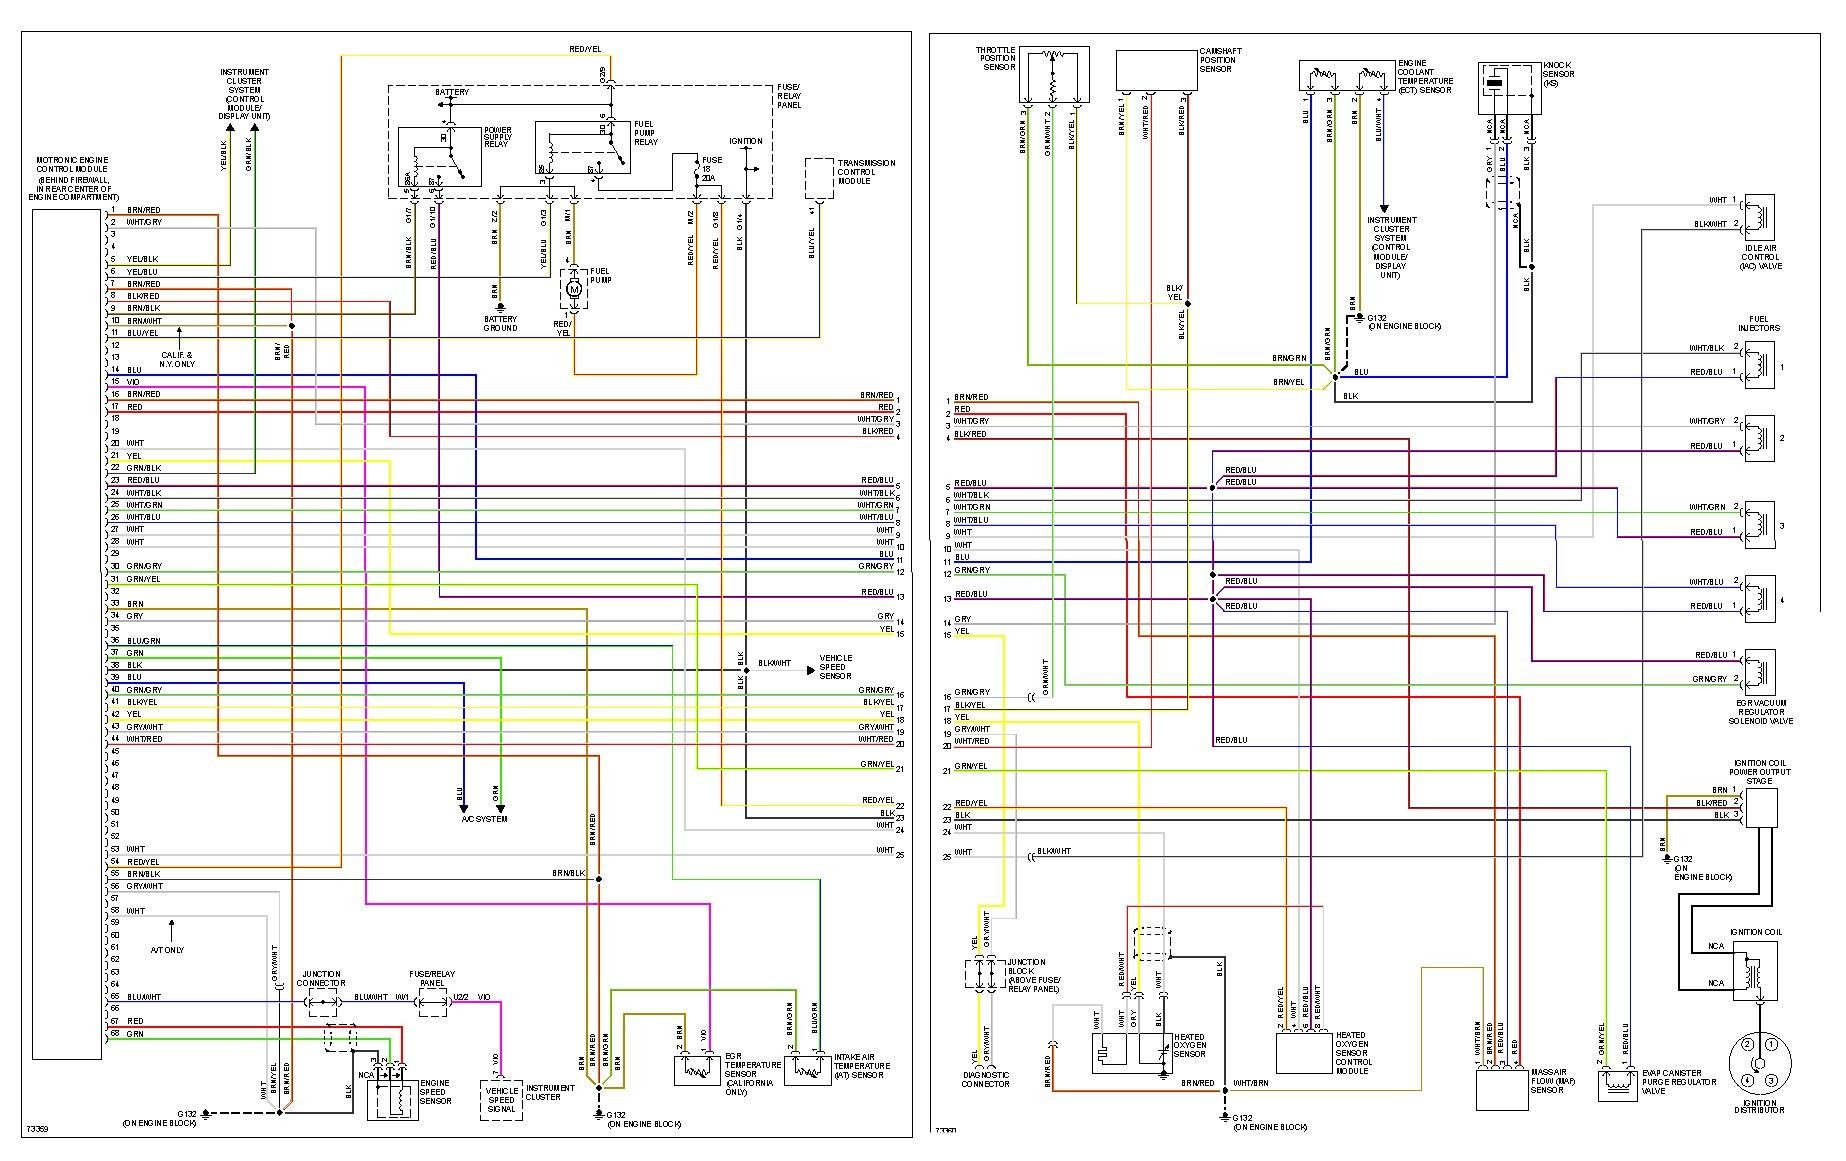 Unique Audi A4 Central Locking Pump Wiring Diagram Diagram Diagramtemplate Diagramsample Jetta A2 Jetta A4 Chevrolet Astra